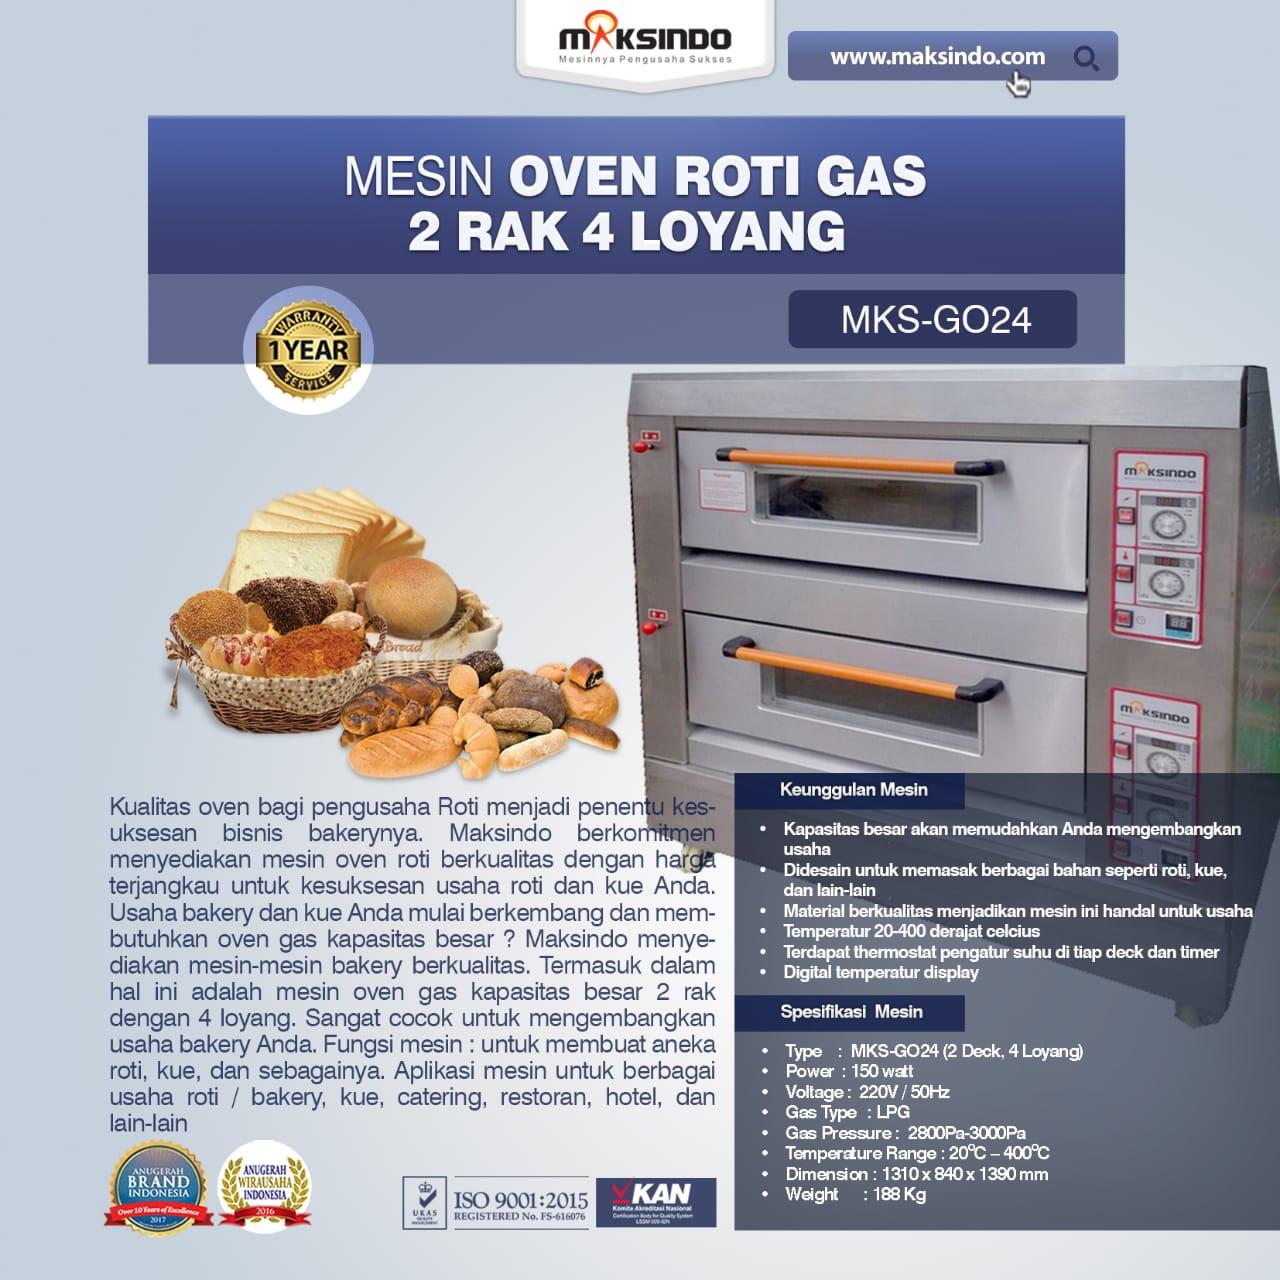 Jual Mesin Oven Roti Gas 2 Rak 4 Loyang (GO24) di Mataram